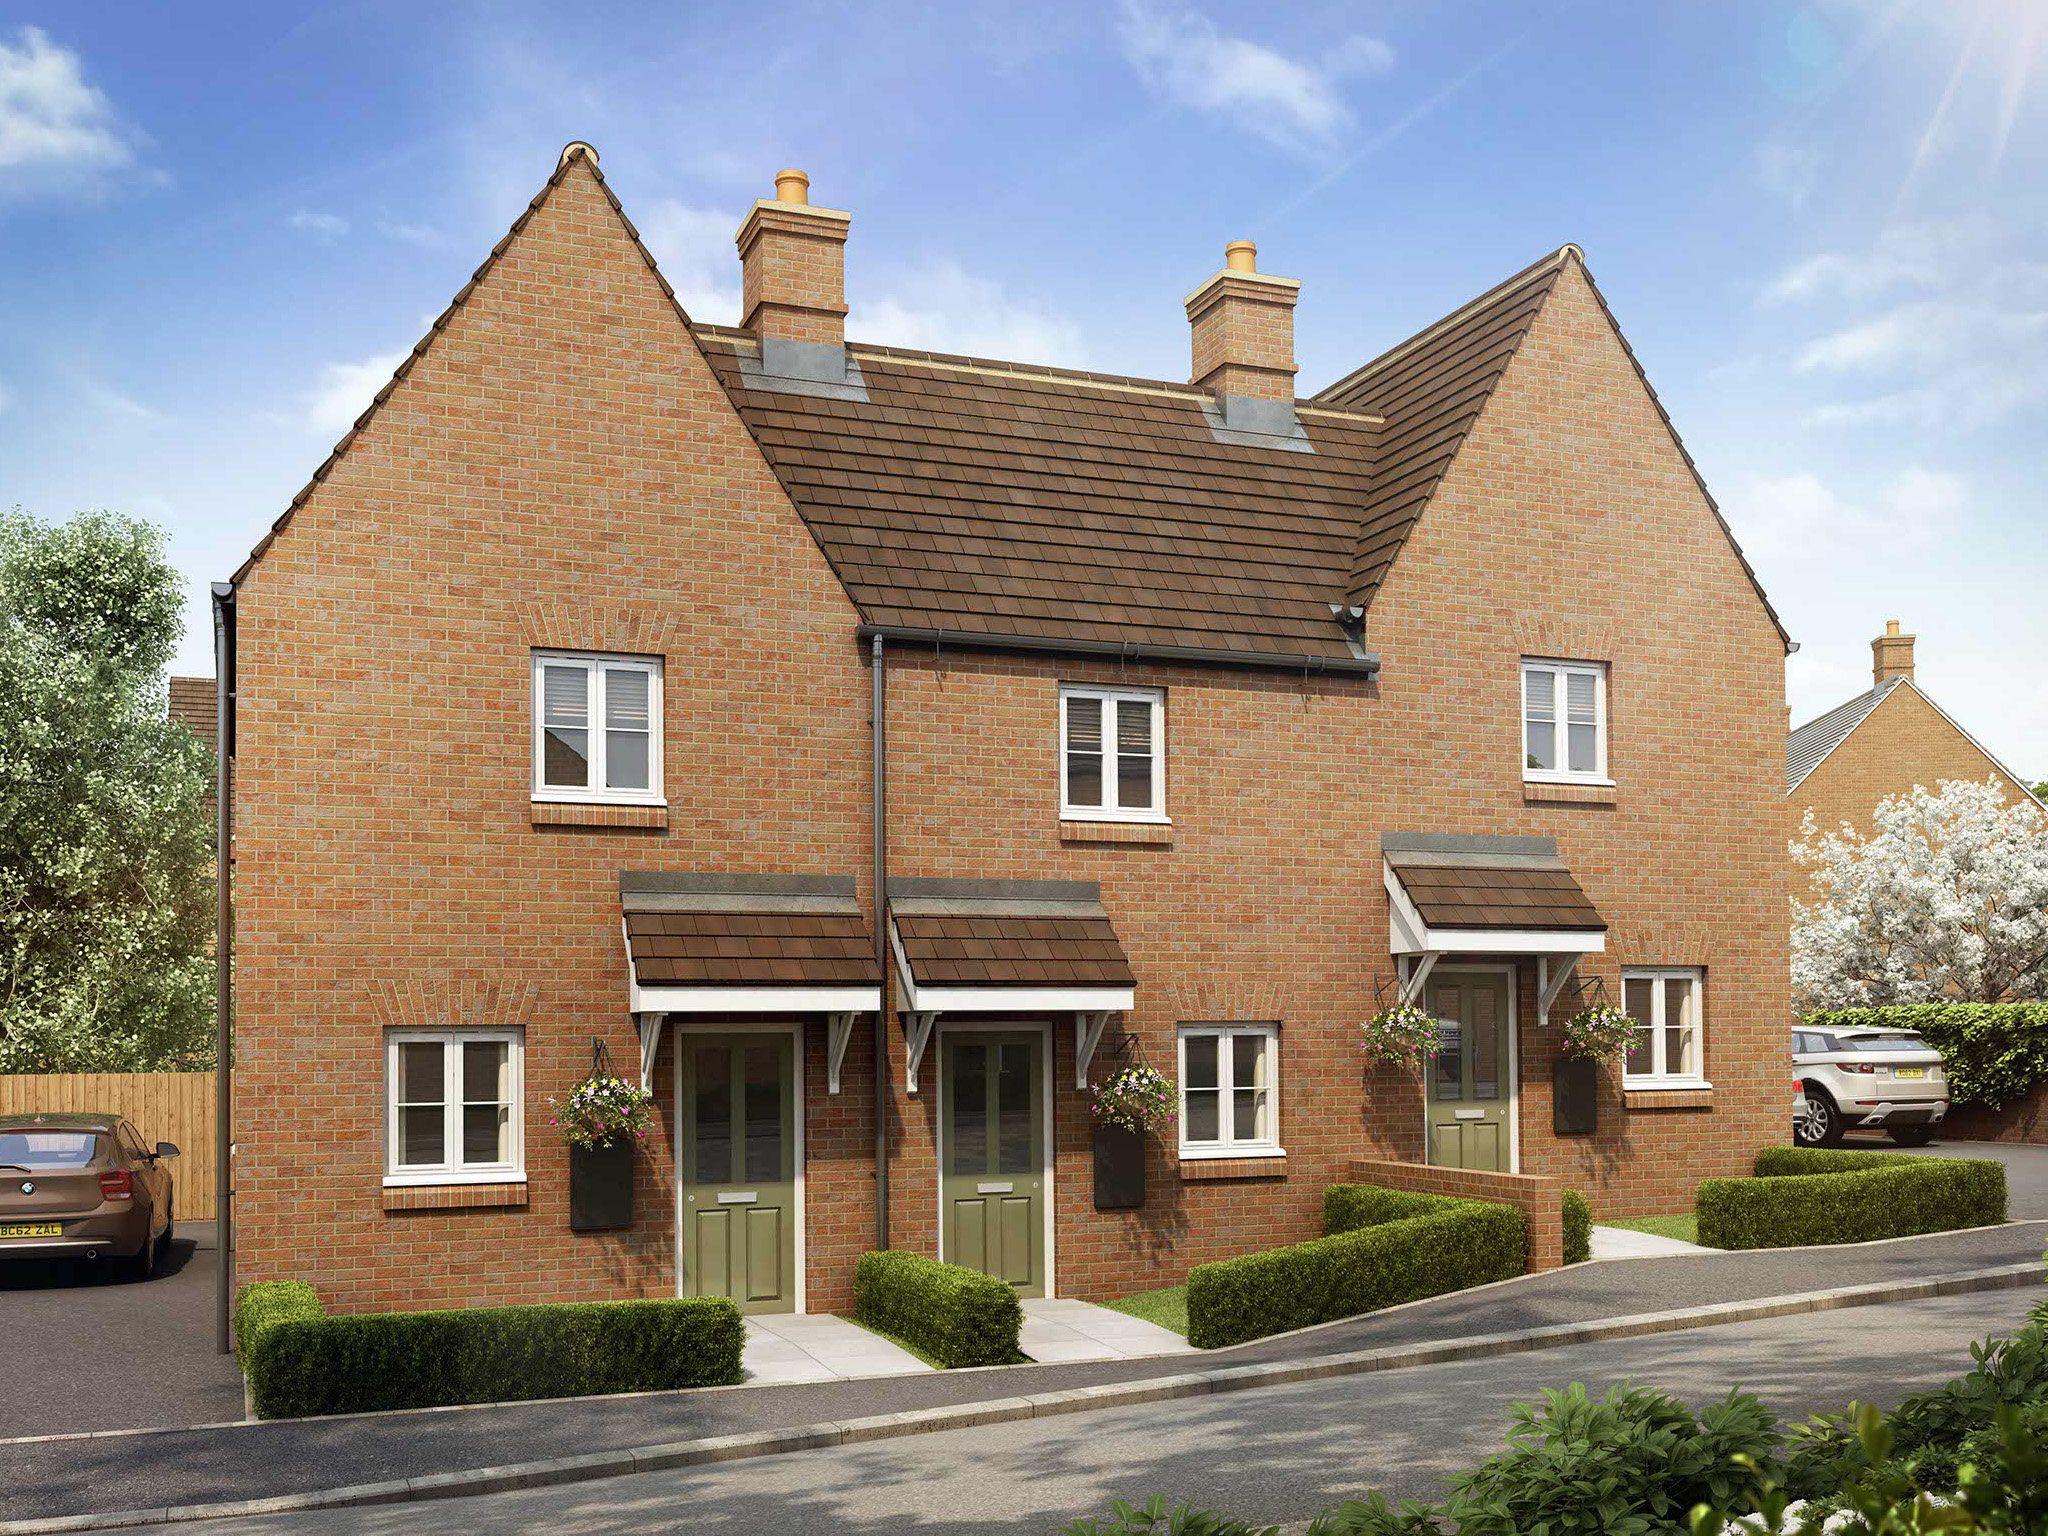 The Furlongs @ Towcester Grange development image 1 of 1